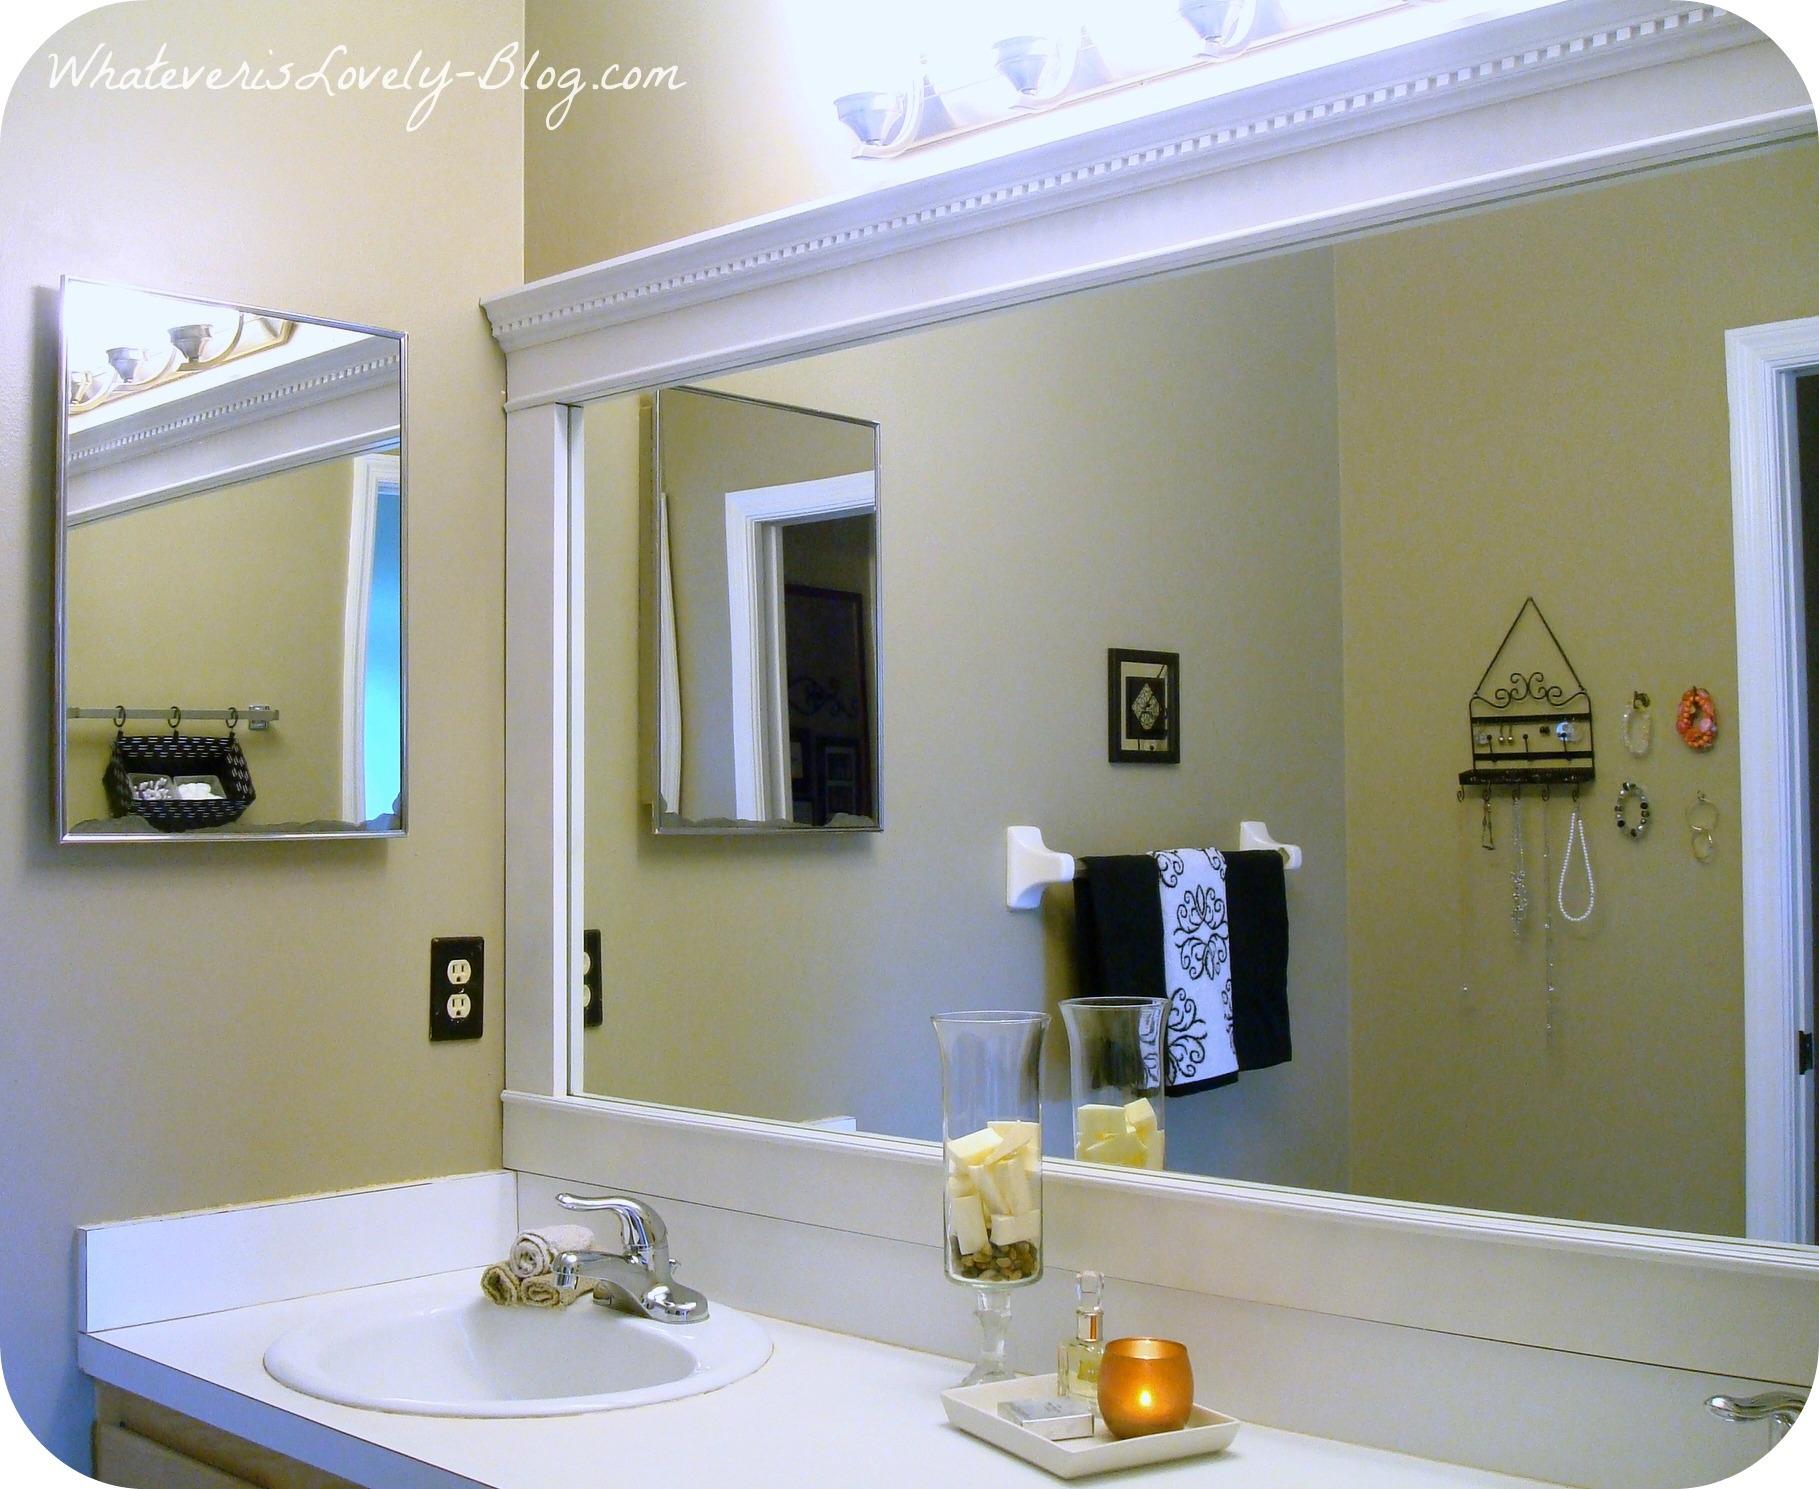 Crown Molding Around Bathroom Mirrora reason why you shouldnt demolish your old barn just yet